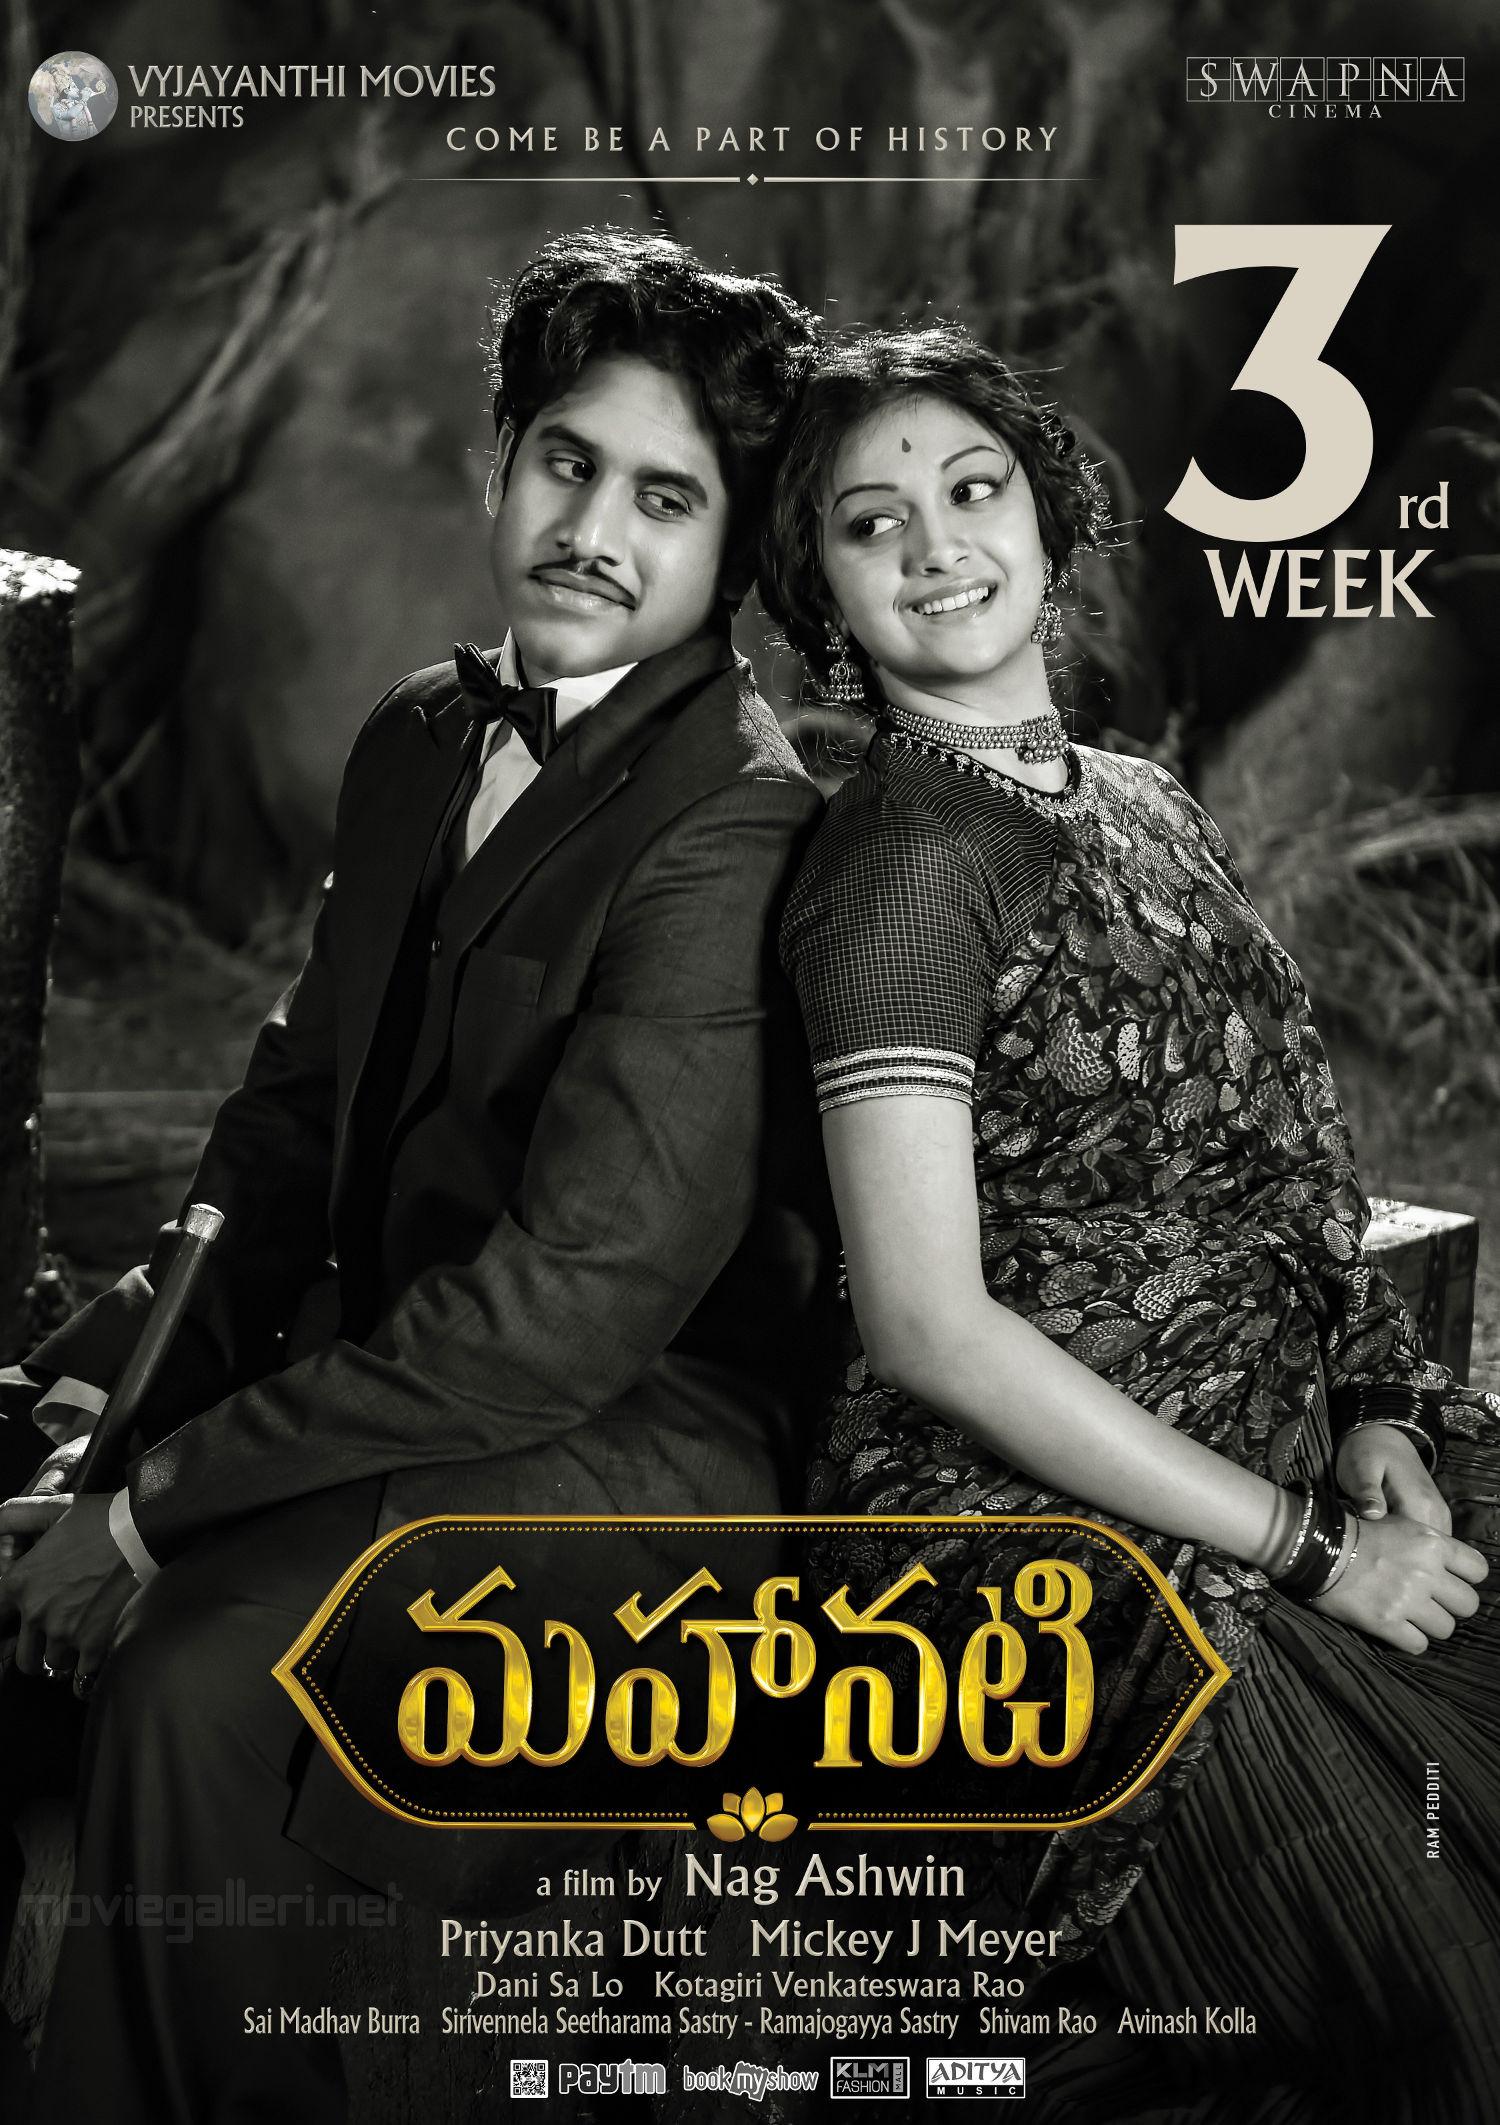 Naga Chaitanya, Keerthy Suresh in Mahanati Movie 3rd Week Poster HD